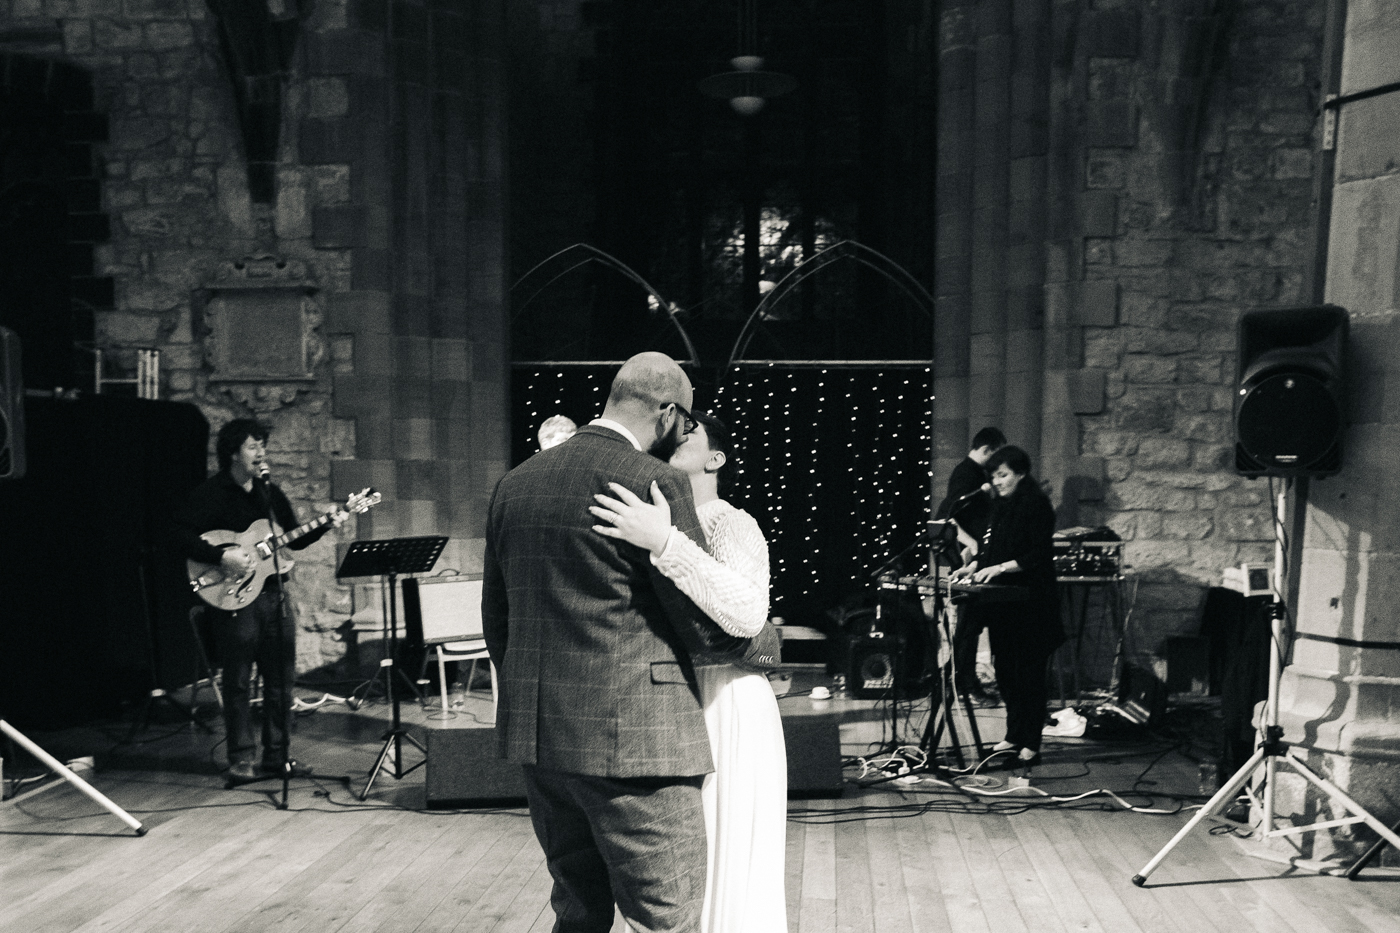 teesside-newcastle-gateshead-wedding-photography-photographer-creative-0075.jpg